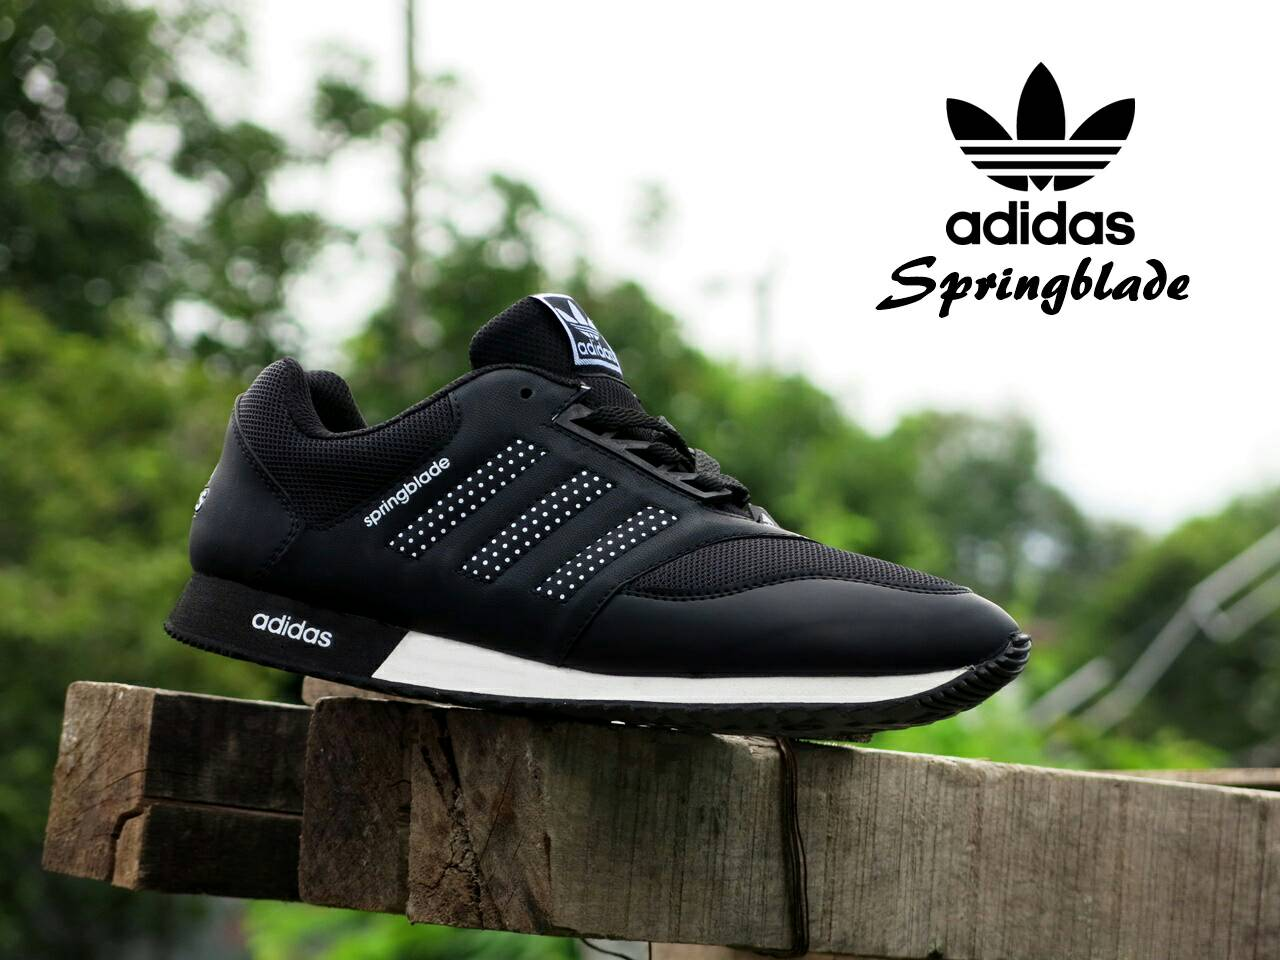 ... good jual sepatu sport adidas springblade hitam putih casual pria  sneakers murah outlet sepatu distro tokopedia aa03652a9a